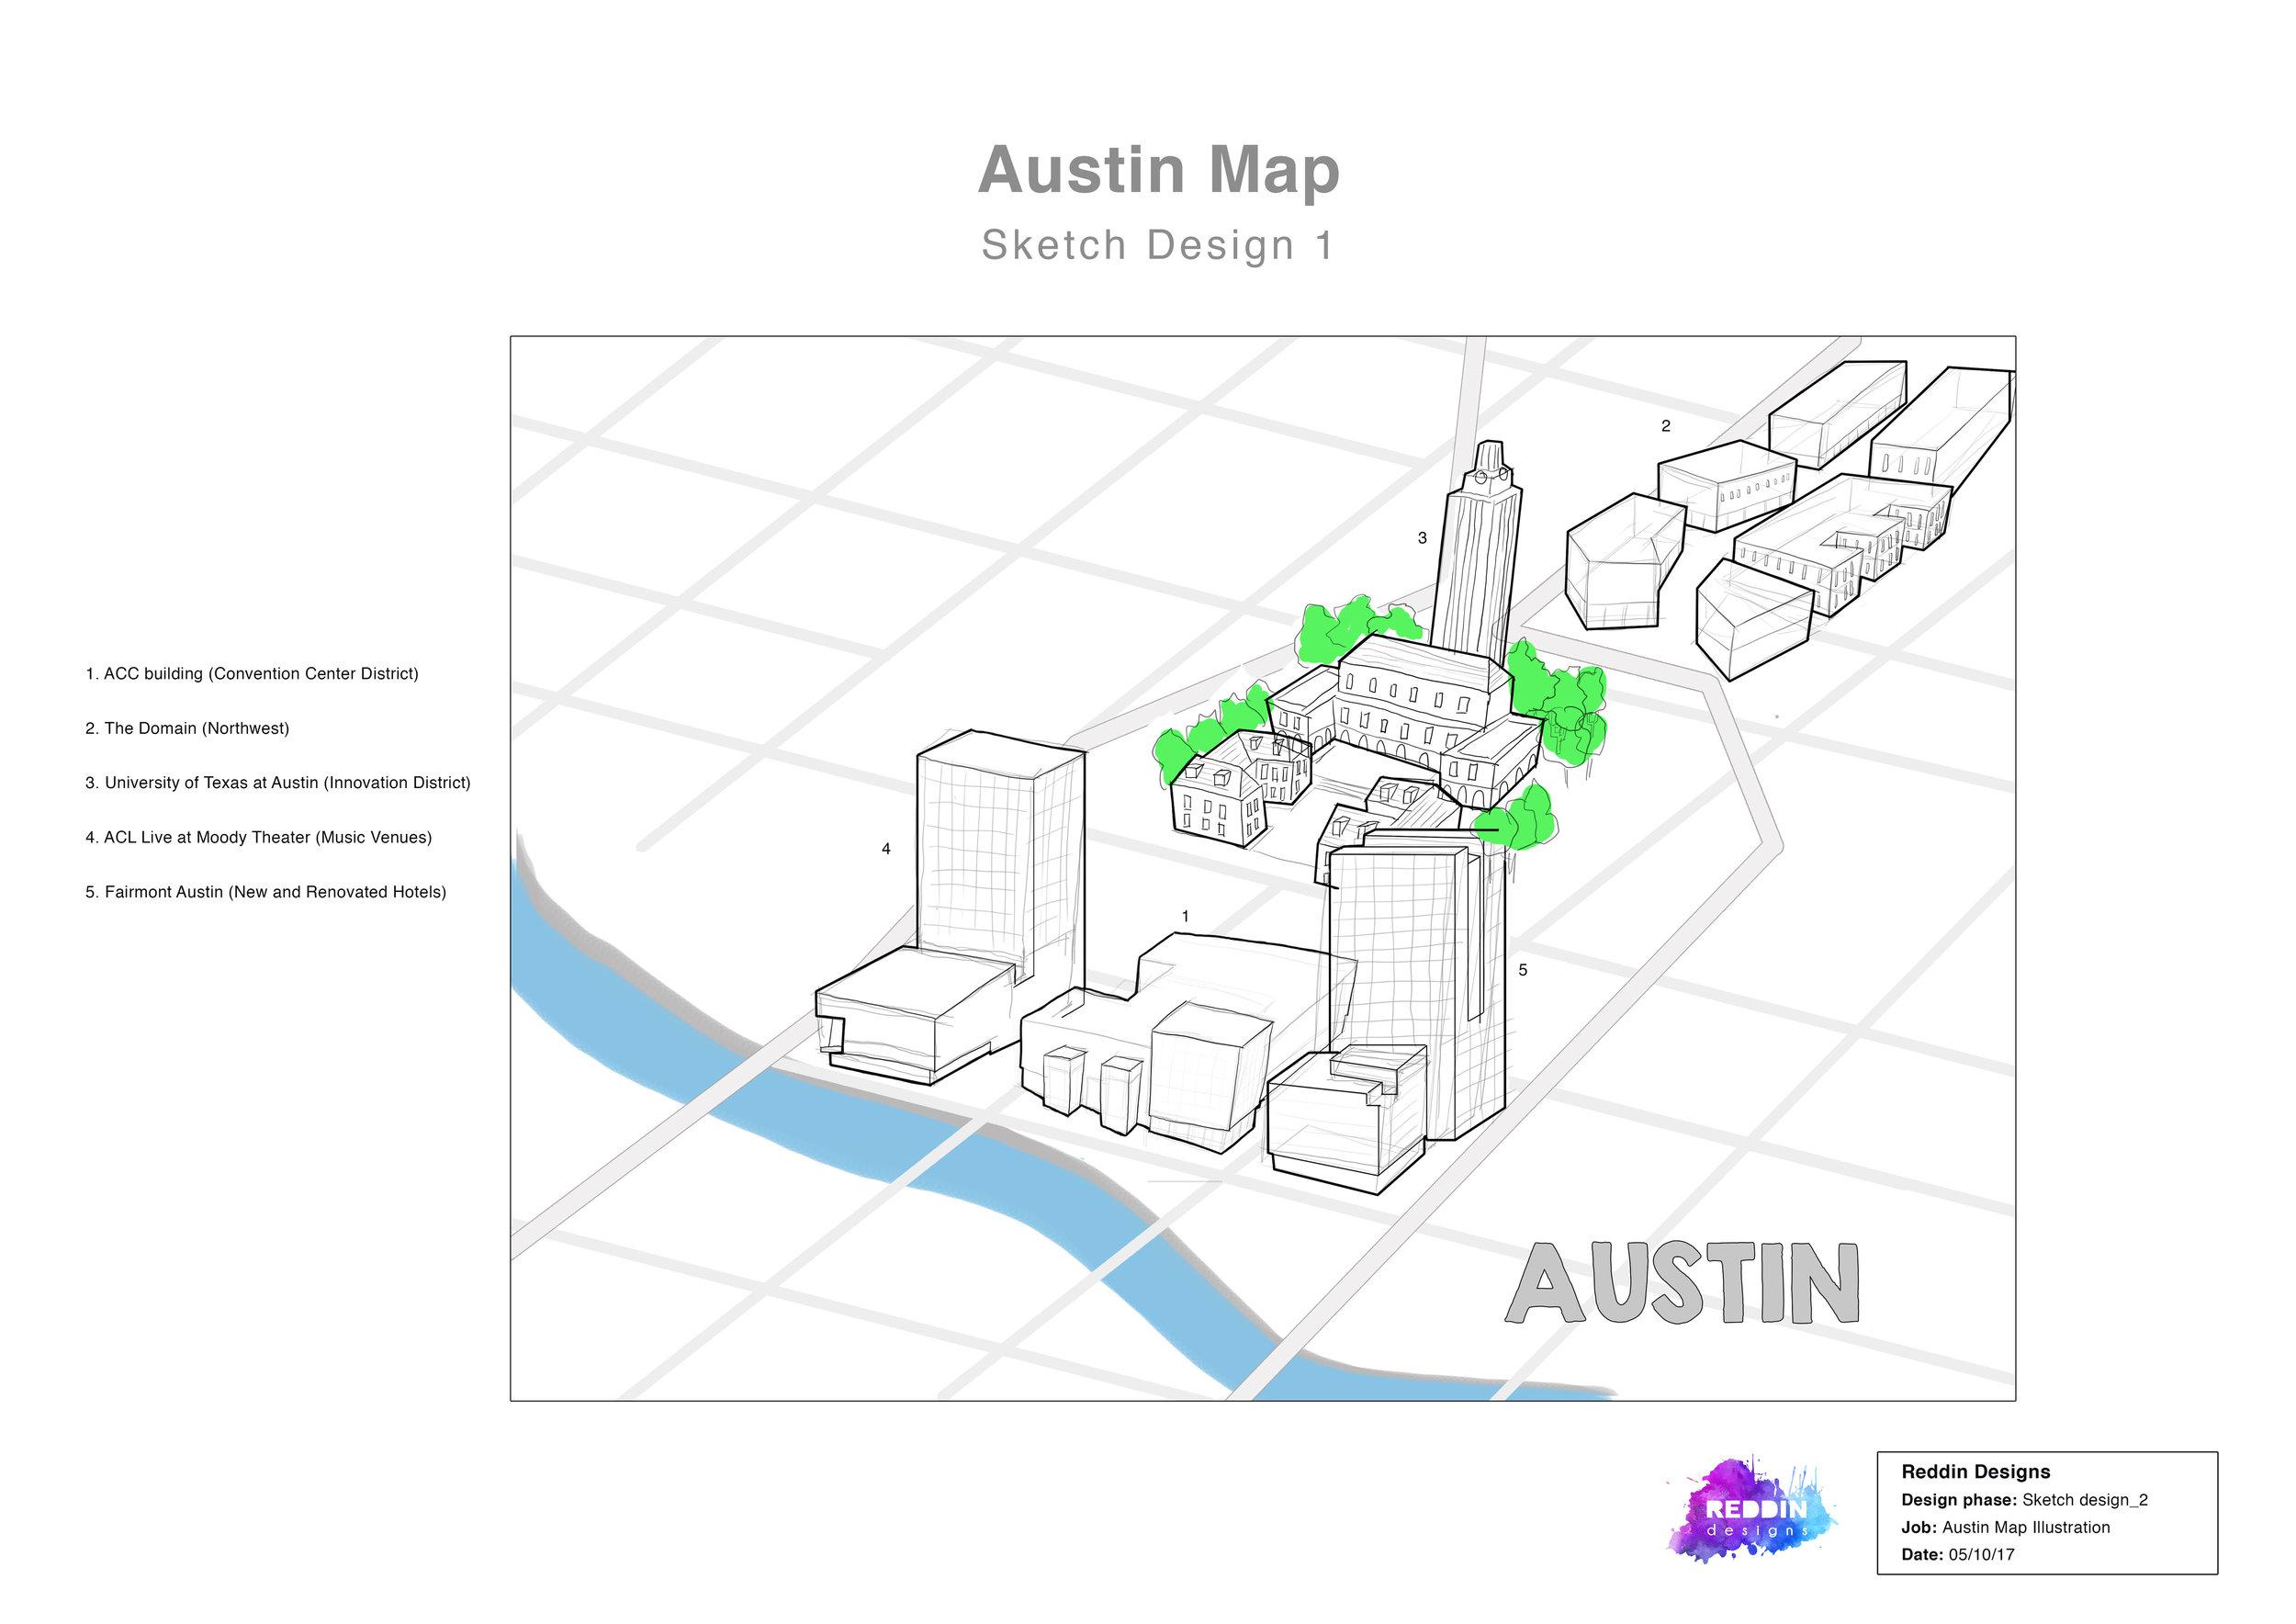 Reddin-Designs-Austin-map-sketch-designs_2-.jpg